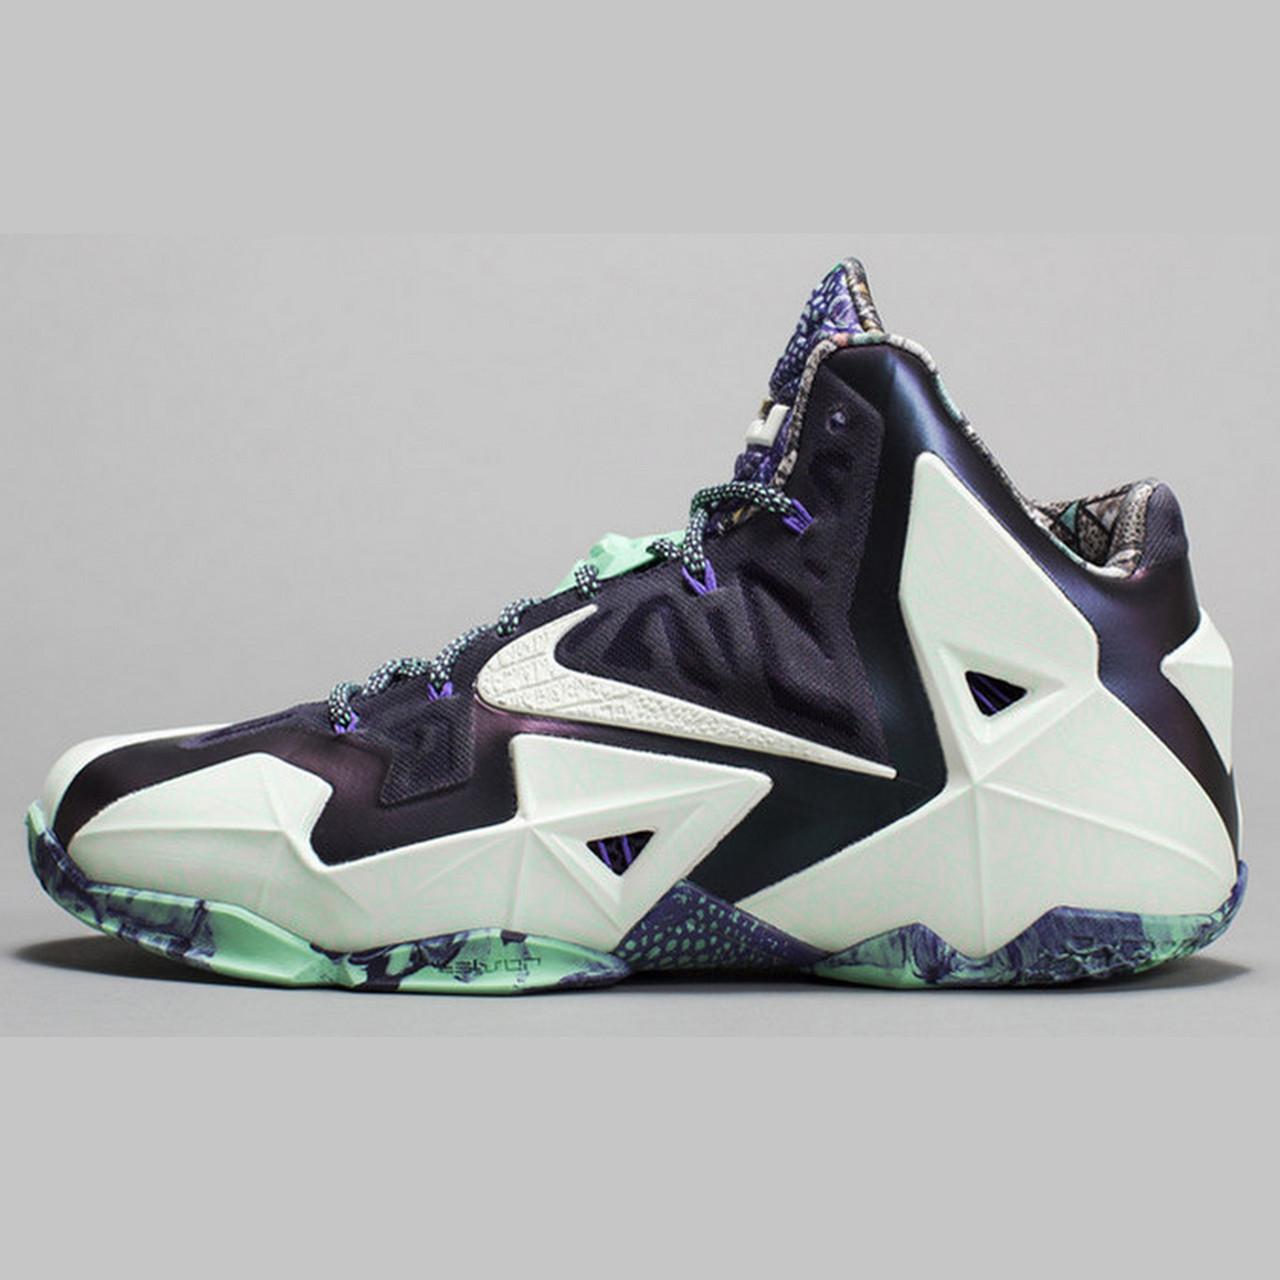 Кроссовки баскетбольные Nike LeBron 11 AS All Star Game Gator King  647780-735 (в стиле Найк) 814bb18f423